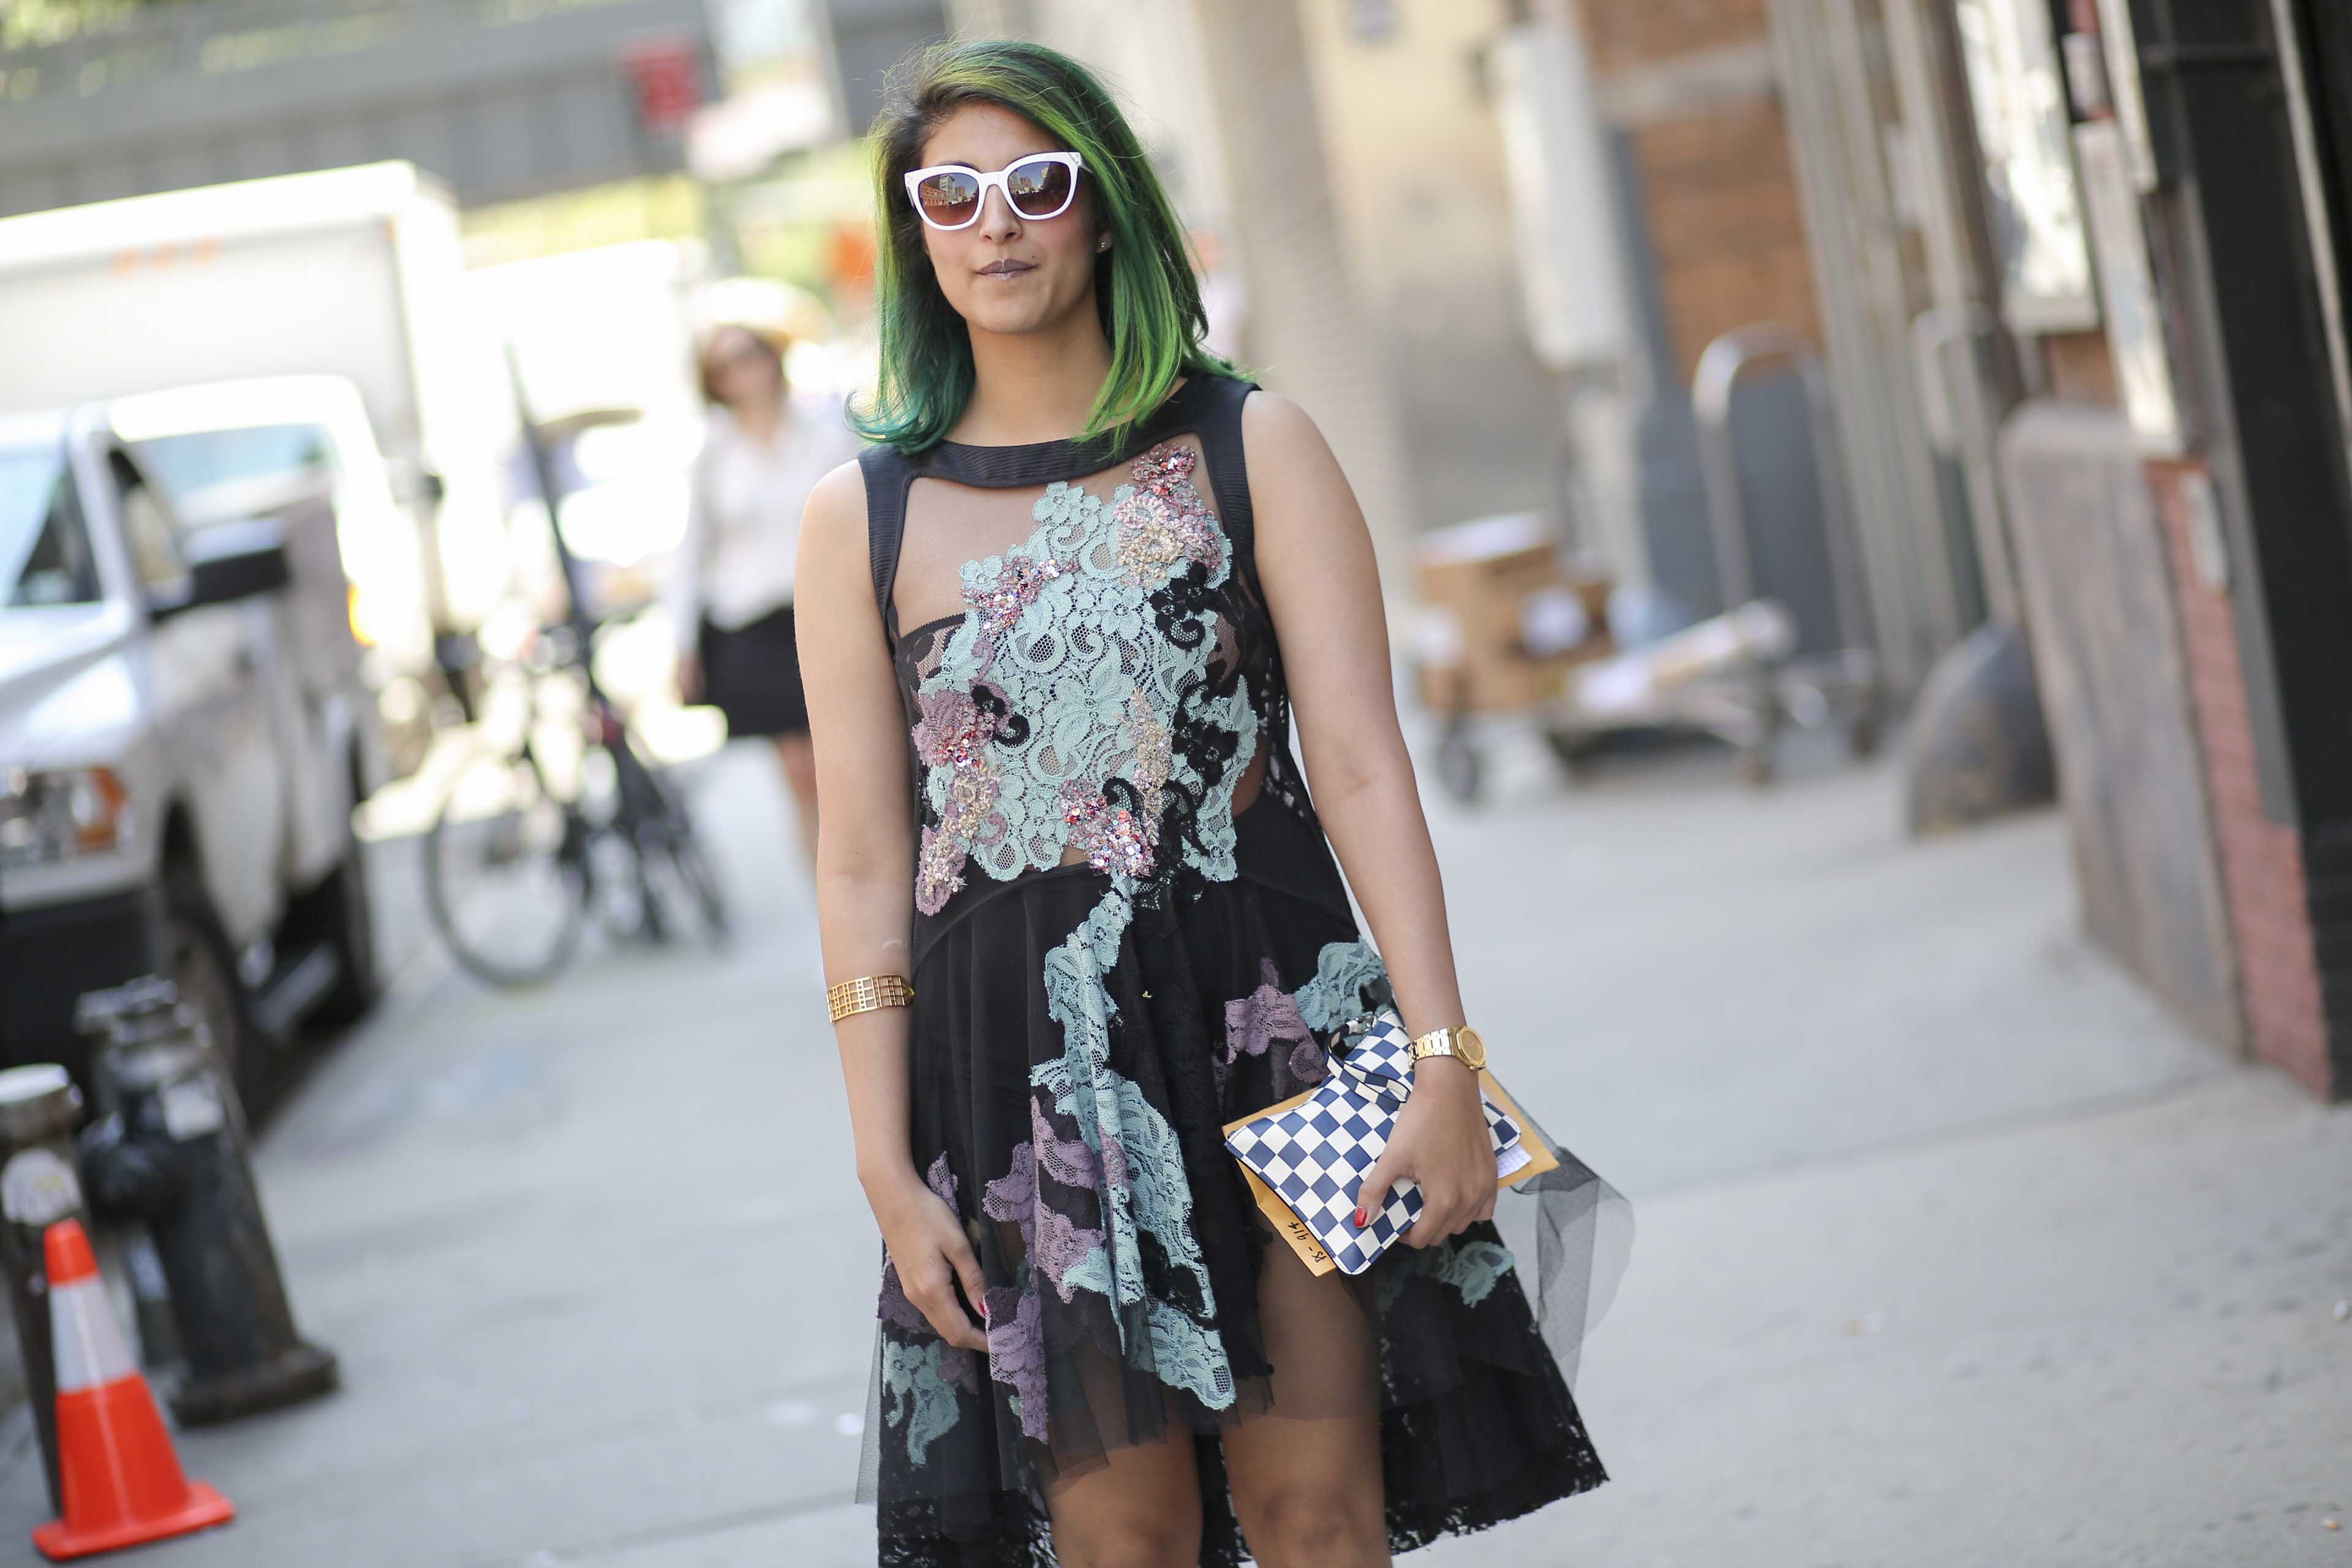 Warna rambut hijau muda mermaid hair.